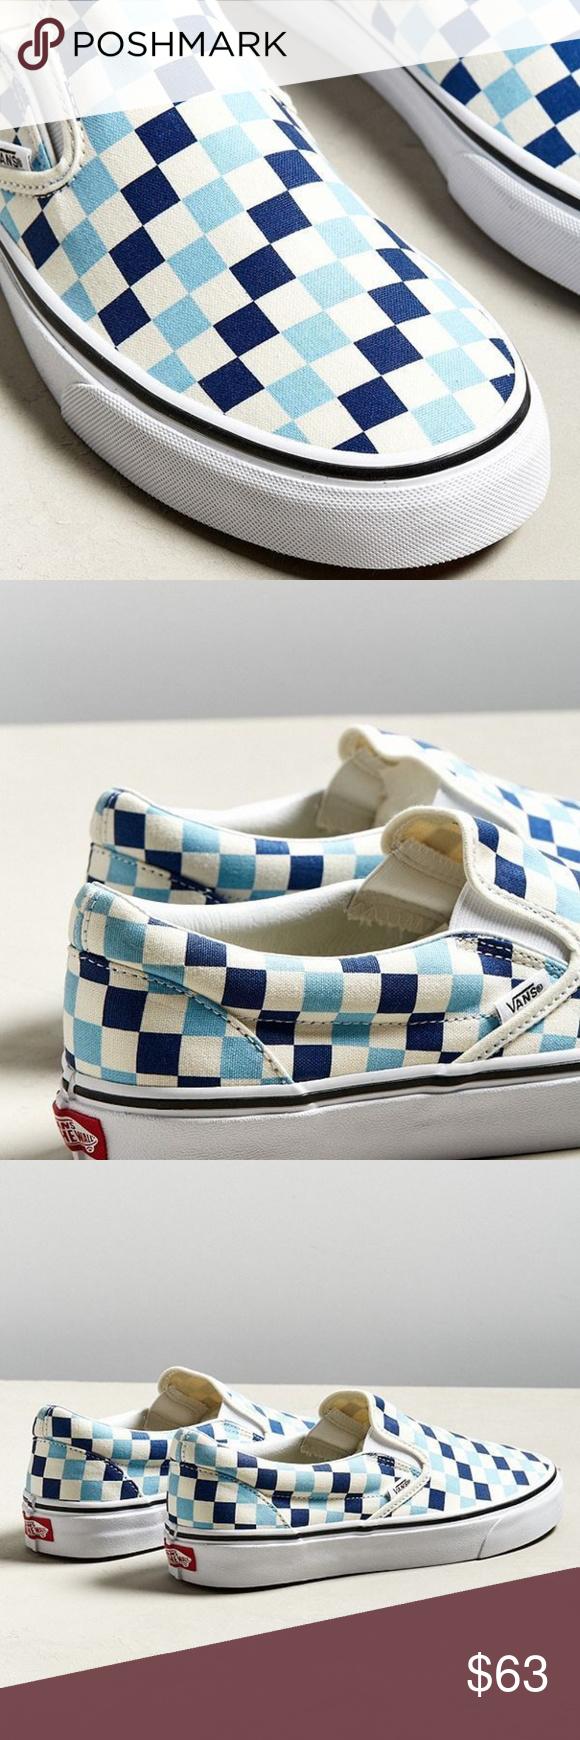 Vans-CHECKERBOARD-SLIP-ON-BLUE-TOPAZ-BLUE-UNISEX- Boutique  afb4a9393